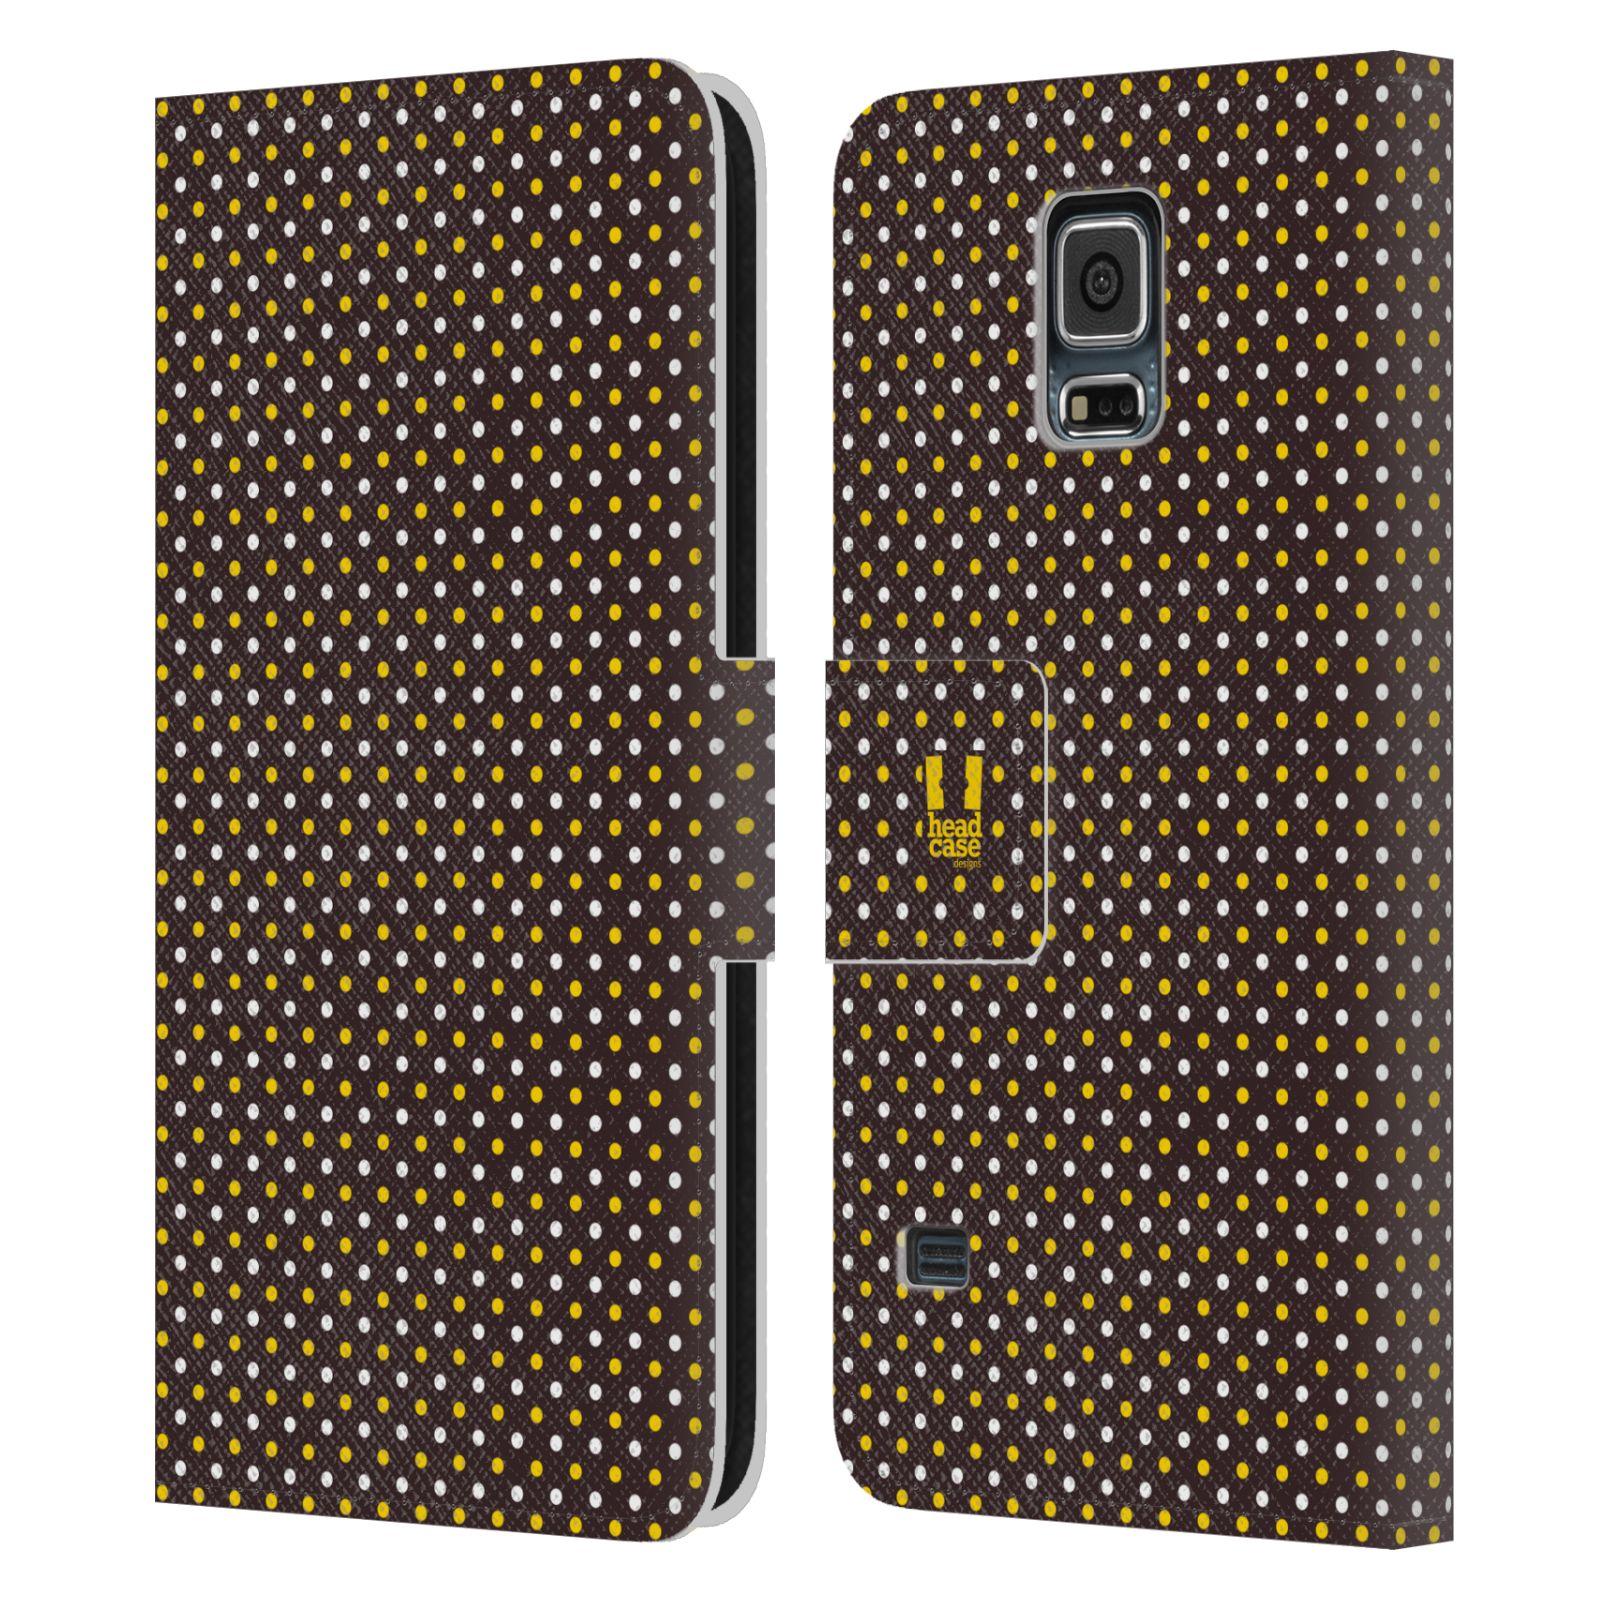 HEAD CASE Flipové pouzdro pro mobil Samsung Galaxy S5 / S5 NEO VČELÍ VZOR puntíky hnědá a žlutá